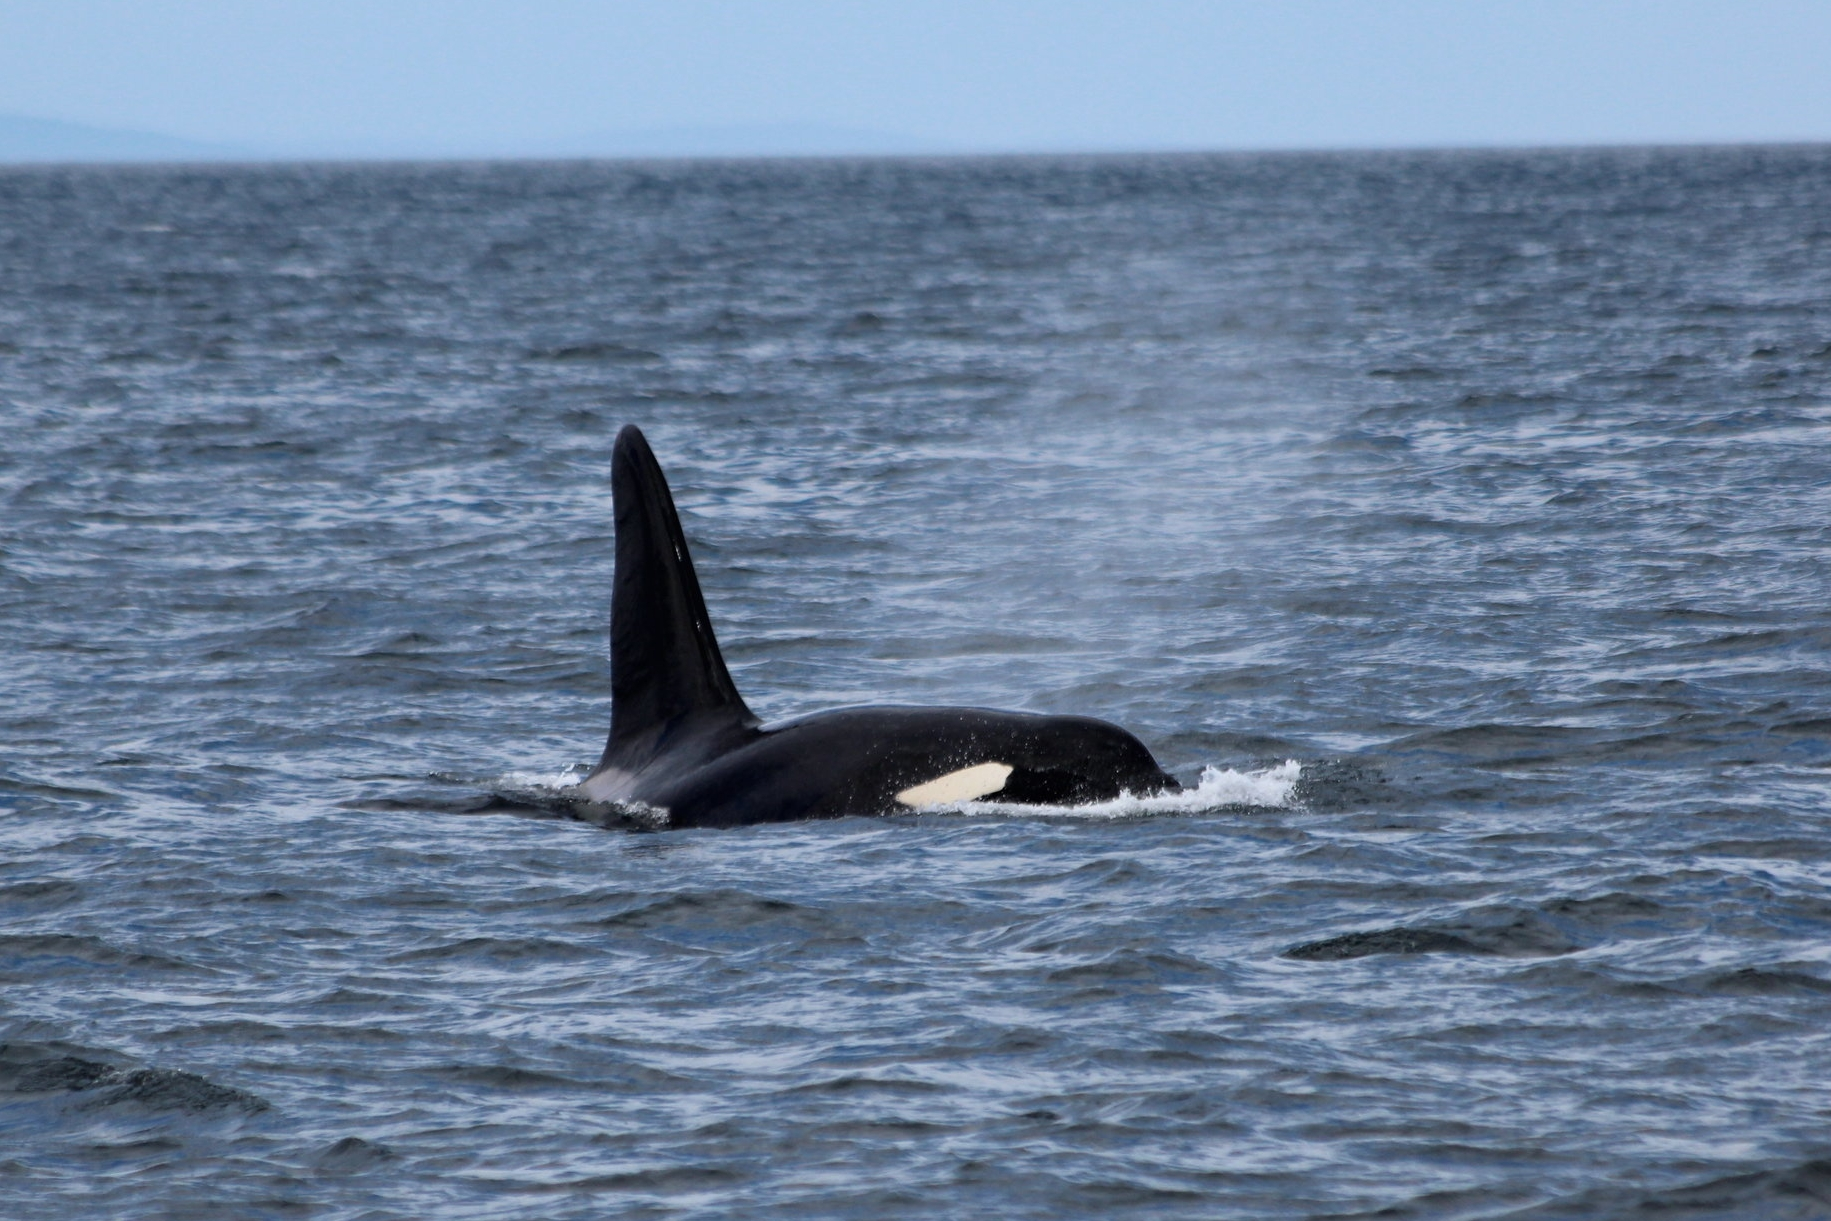 A maximum of eight killer whales now remain in unique West Coast Community Pod.